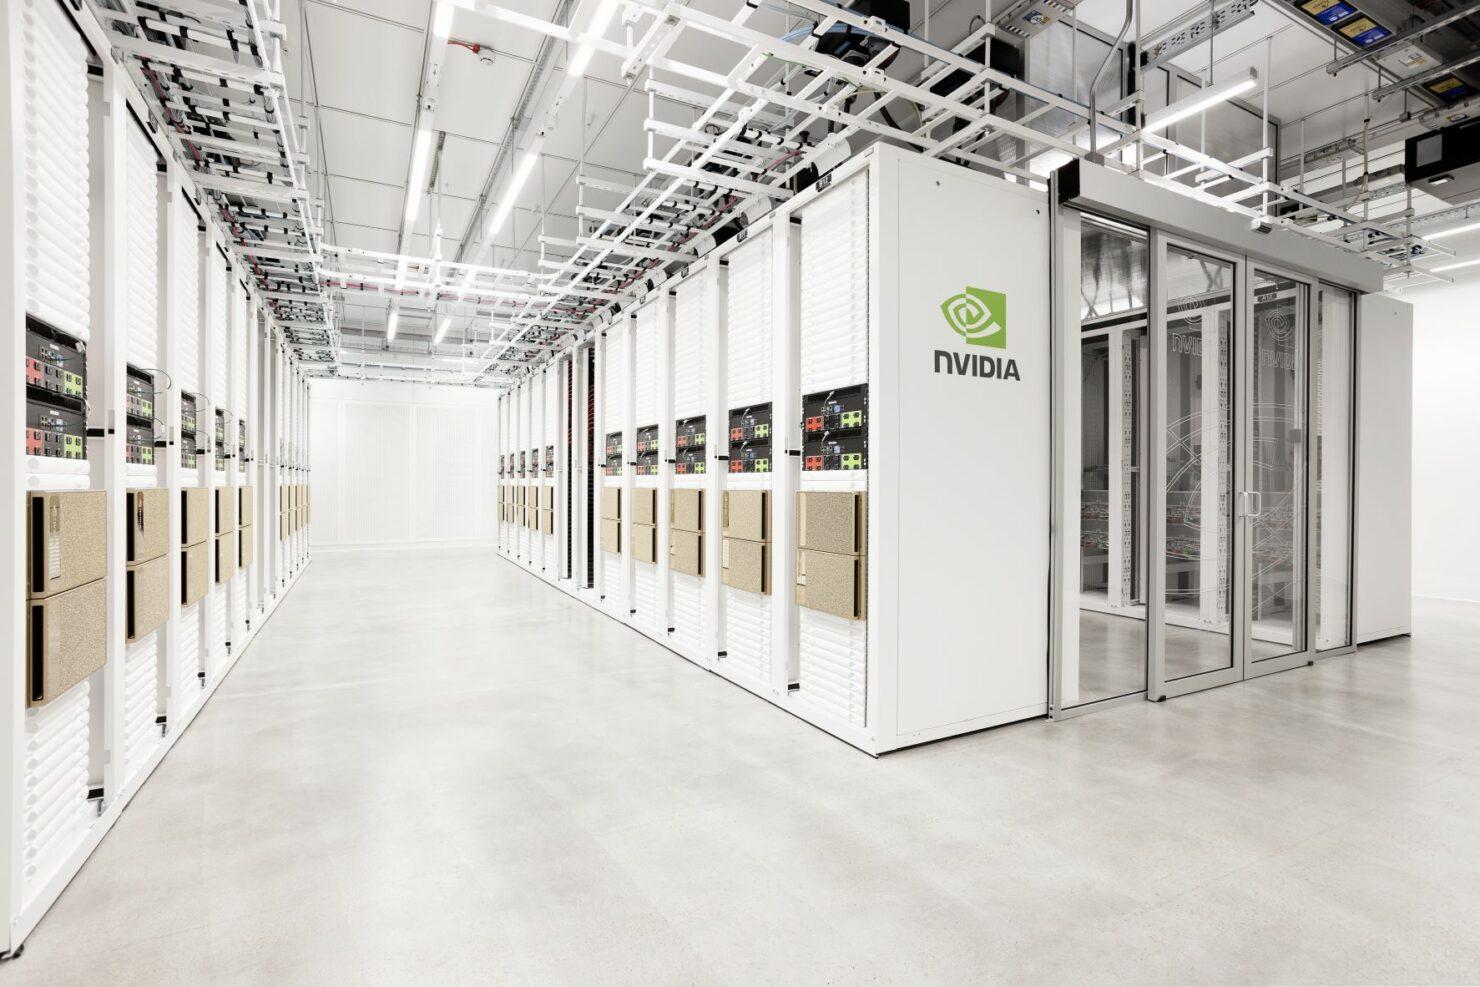 NVIDIA To Open Cambridge-1 Supercomputer For UK Healthcare Startup Companies